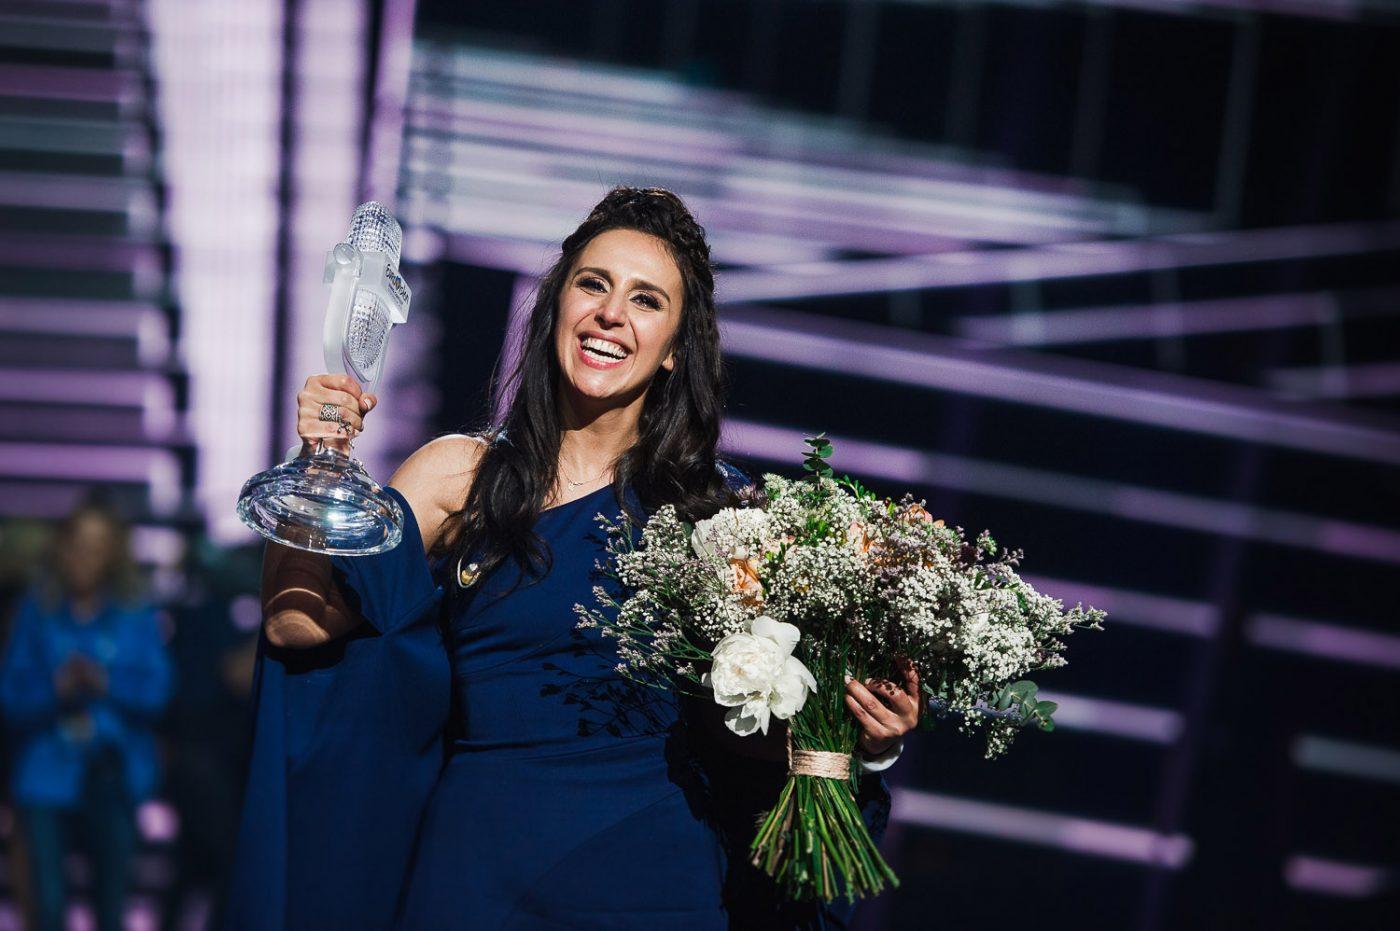 E.sabaliauskaite Vzx.lt Eurovision Final Stockholm 155